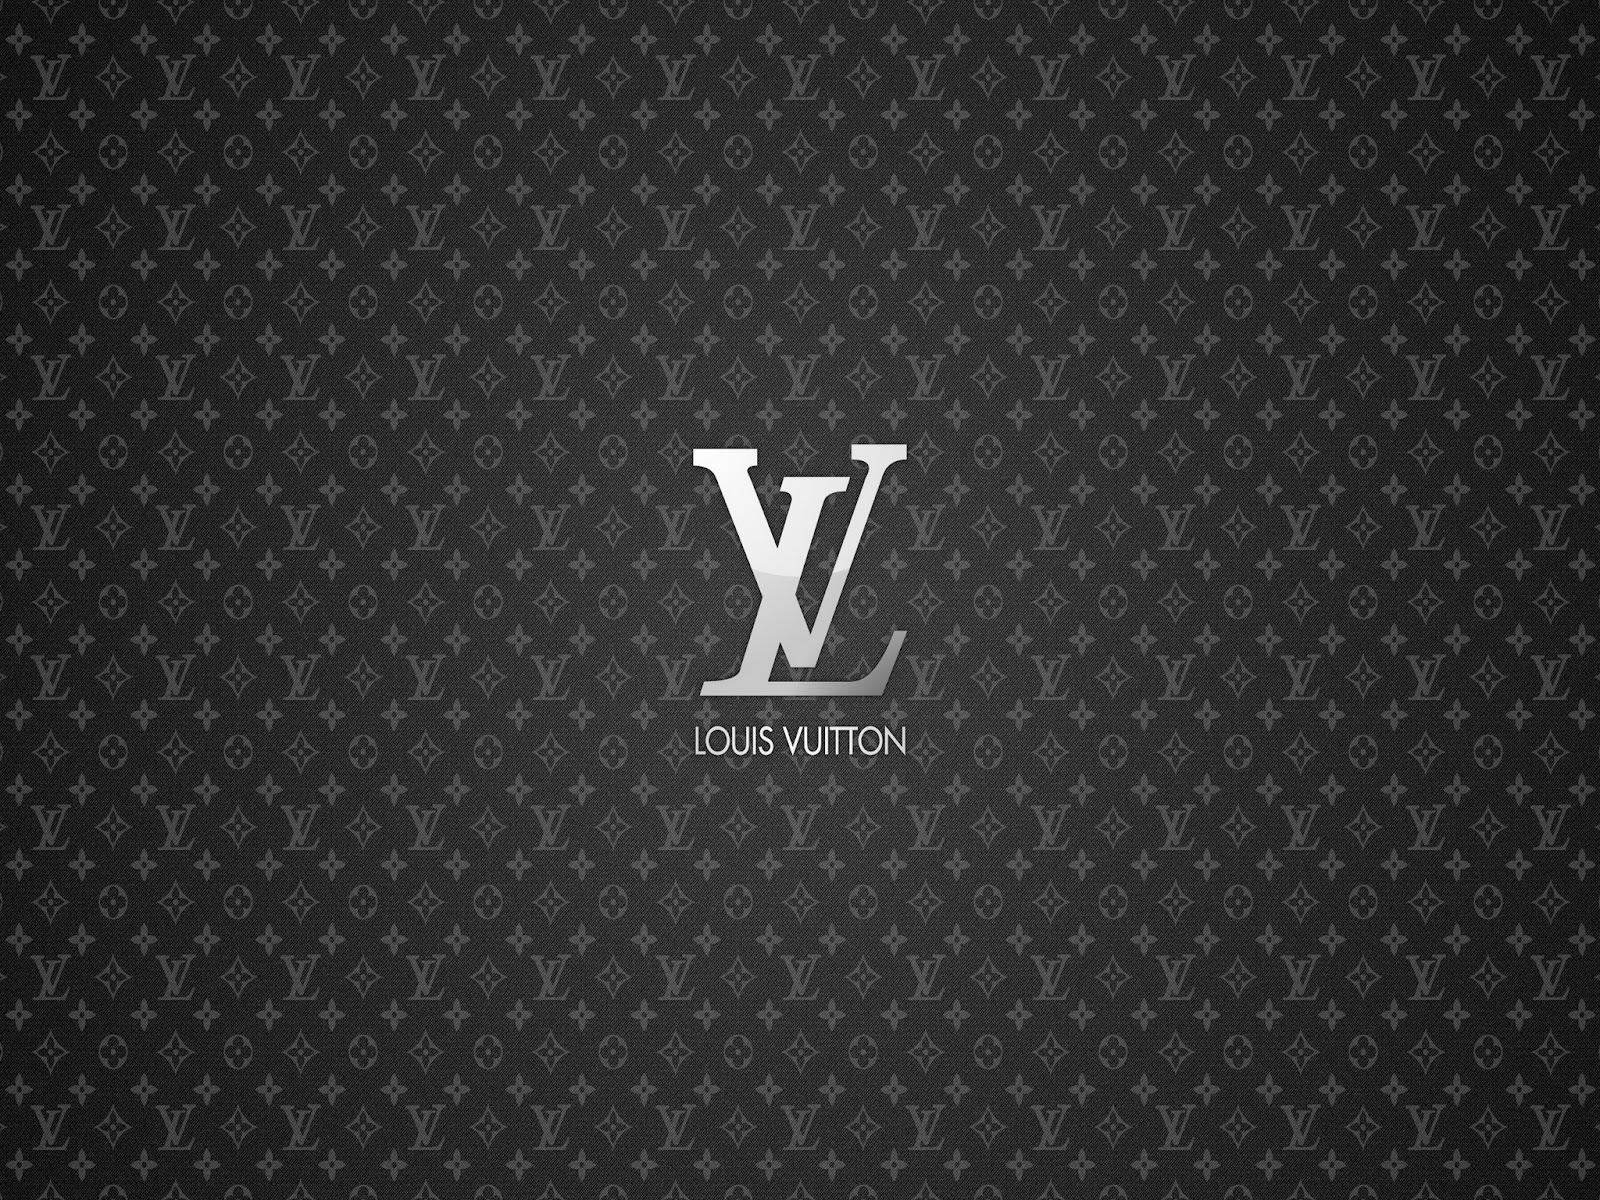 http://1.bp.blogspot.com/-yqdKG_pEsjE/UBU_jNG5ptI/AAAAAAAADRE/q_dWnTOSUsM/s1600/Louis-Vuitton-Wallpaper-New-iPad.jpg